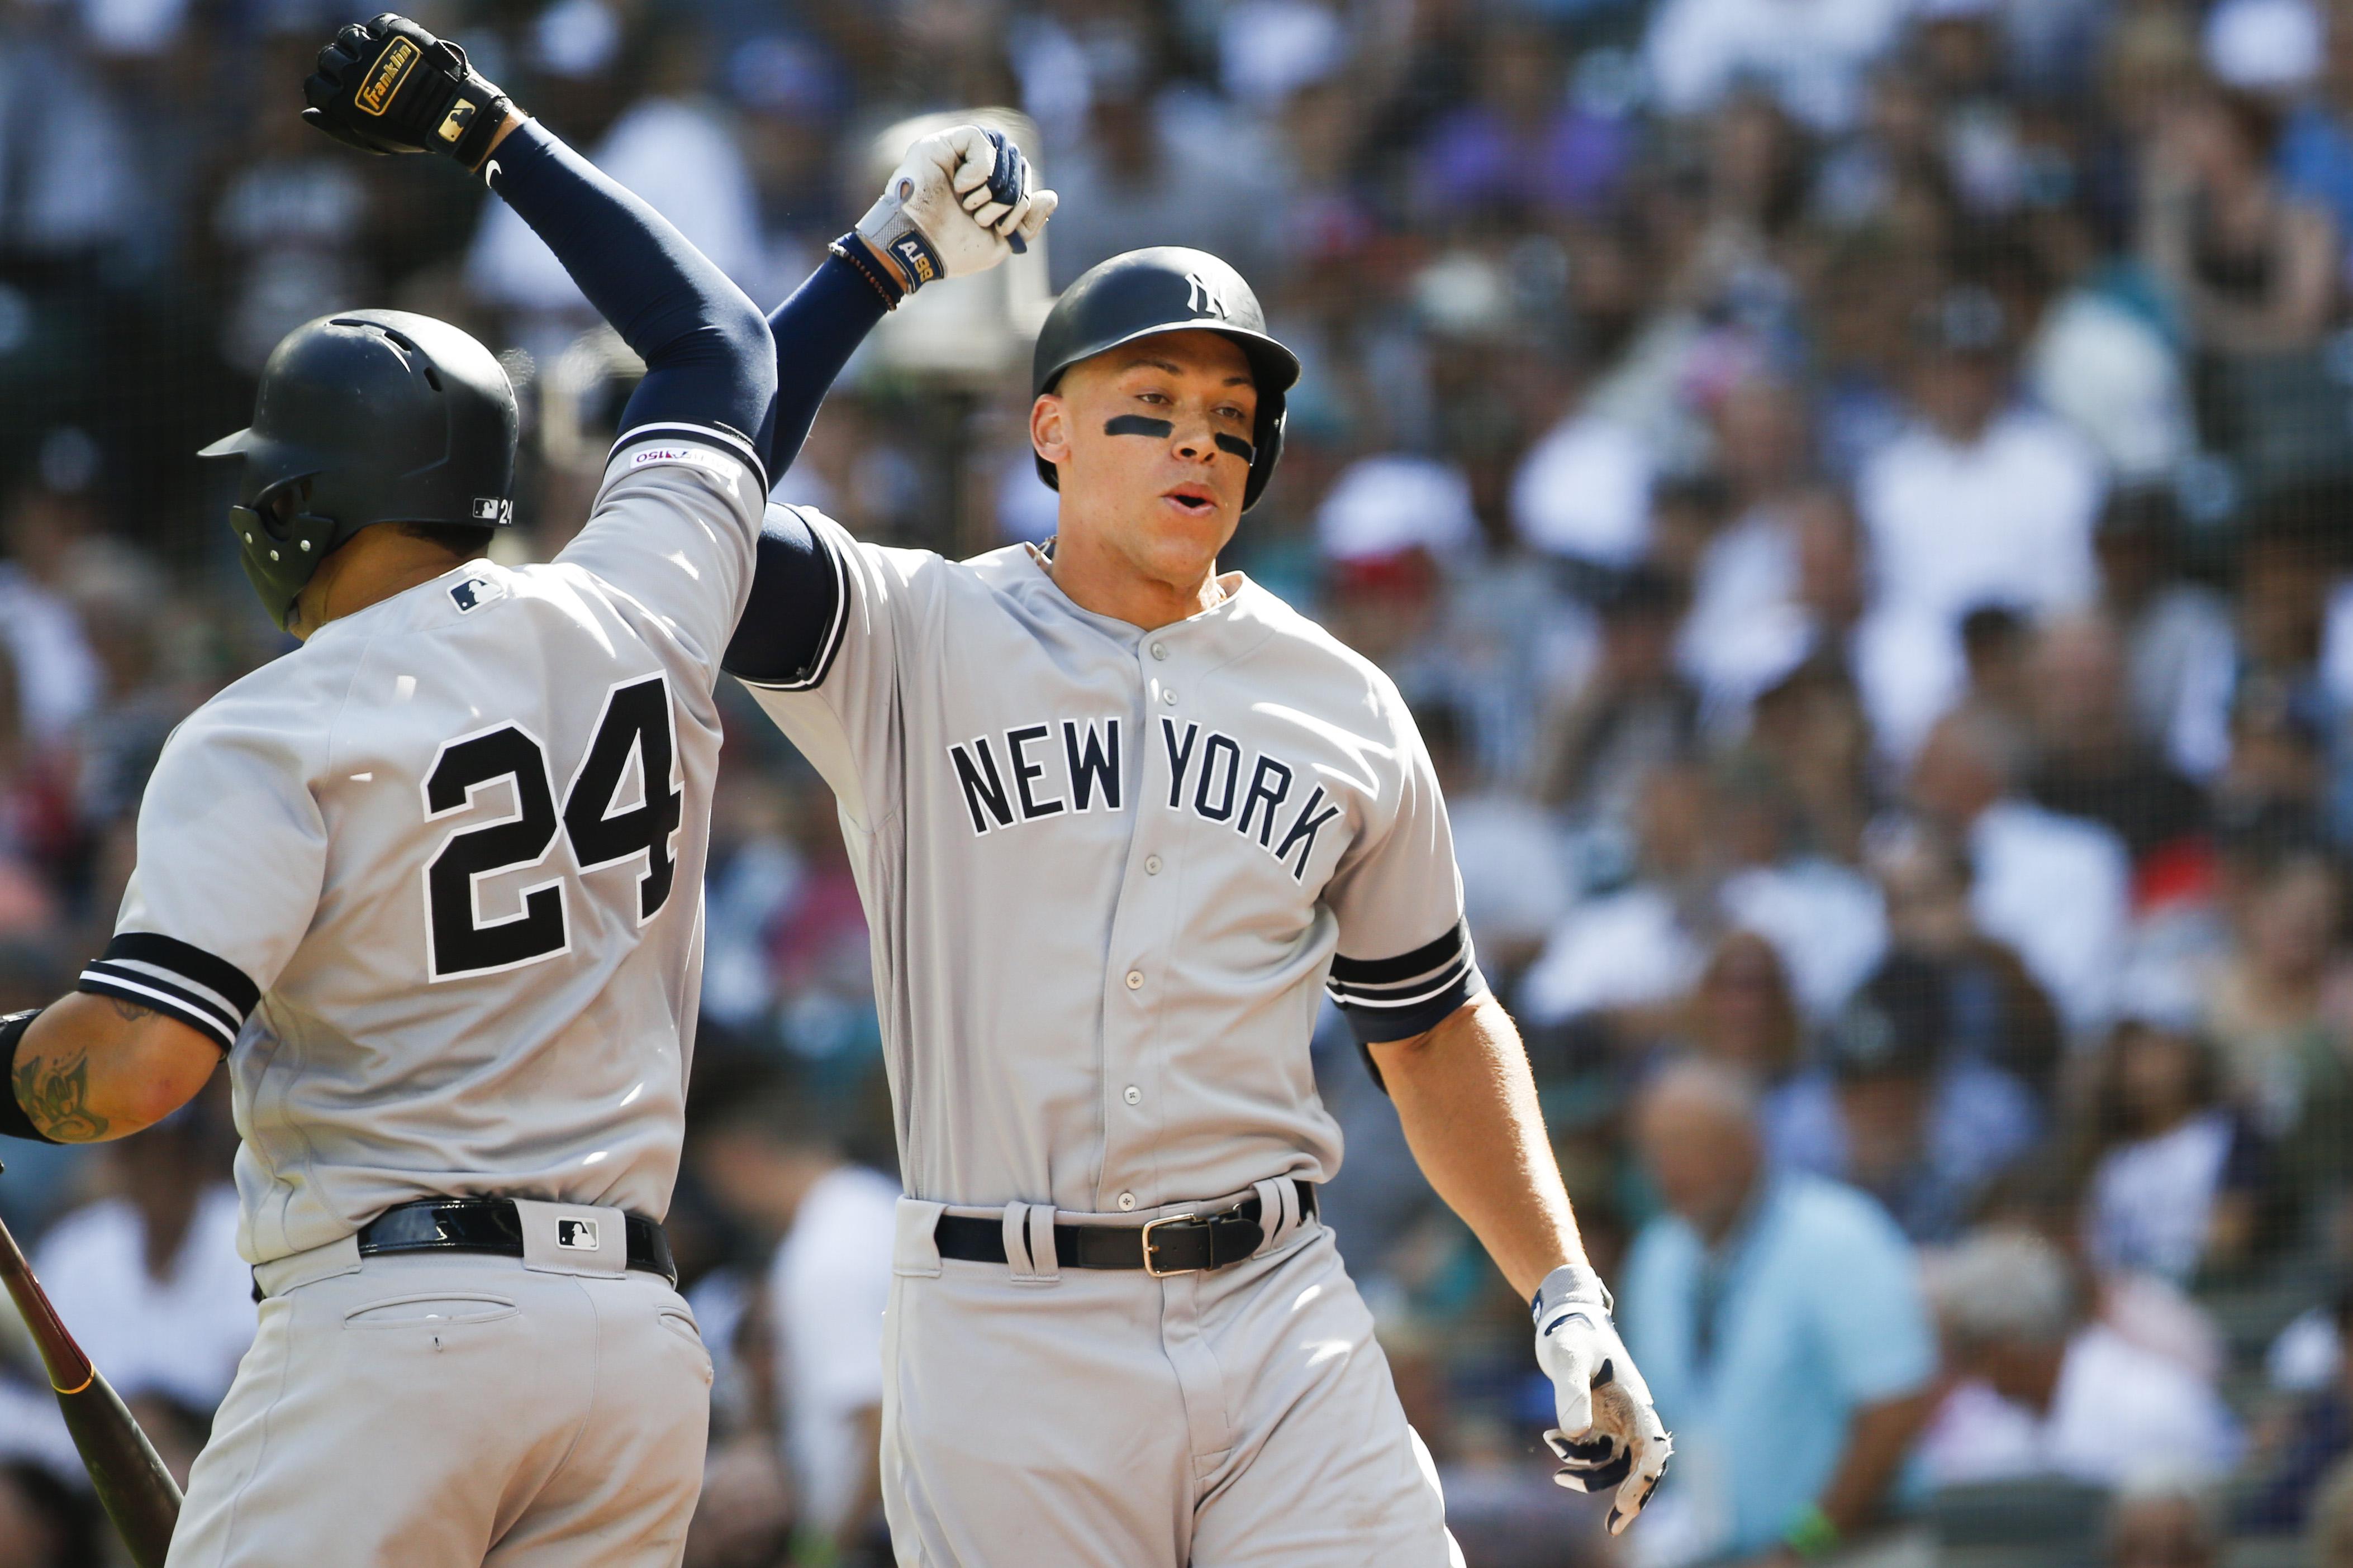 New York Yankees, NYY, Aaron Judge, Gary Sanchez